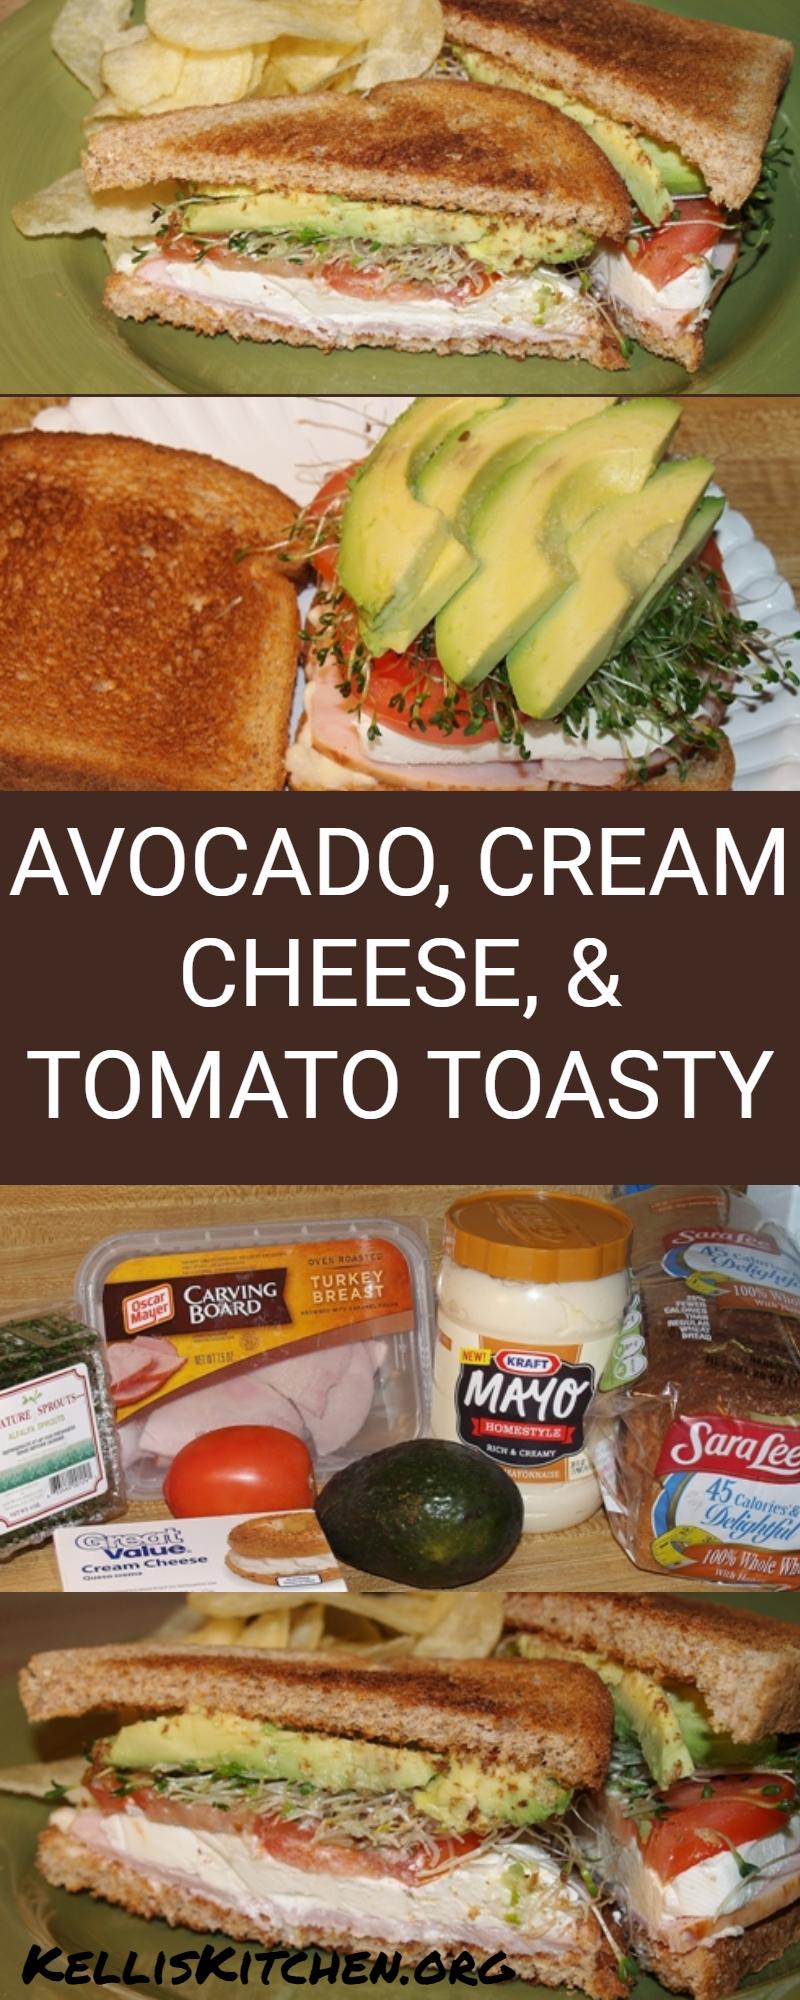 AVOCADO, CREAM CHEESE, AND TOMATO TOASTY